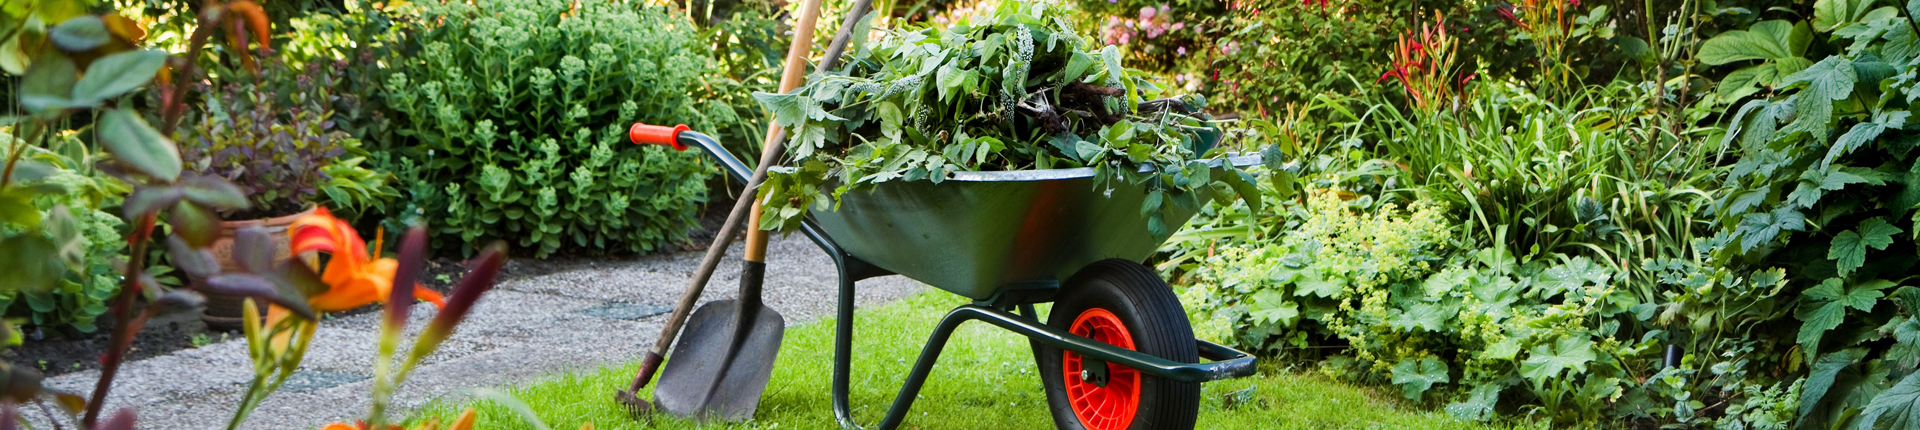 gardening-classes-cork2